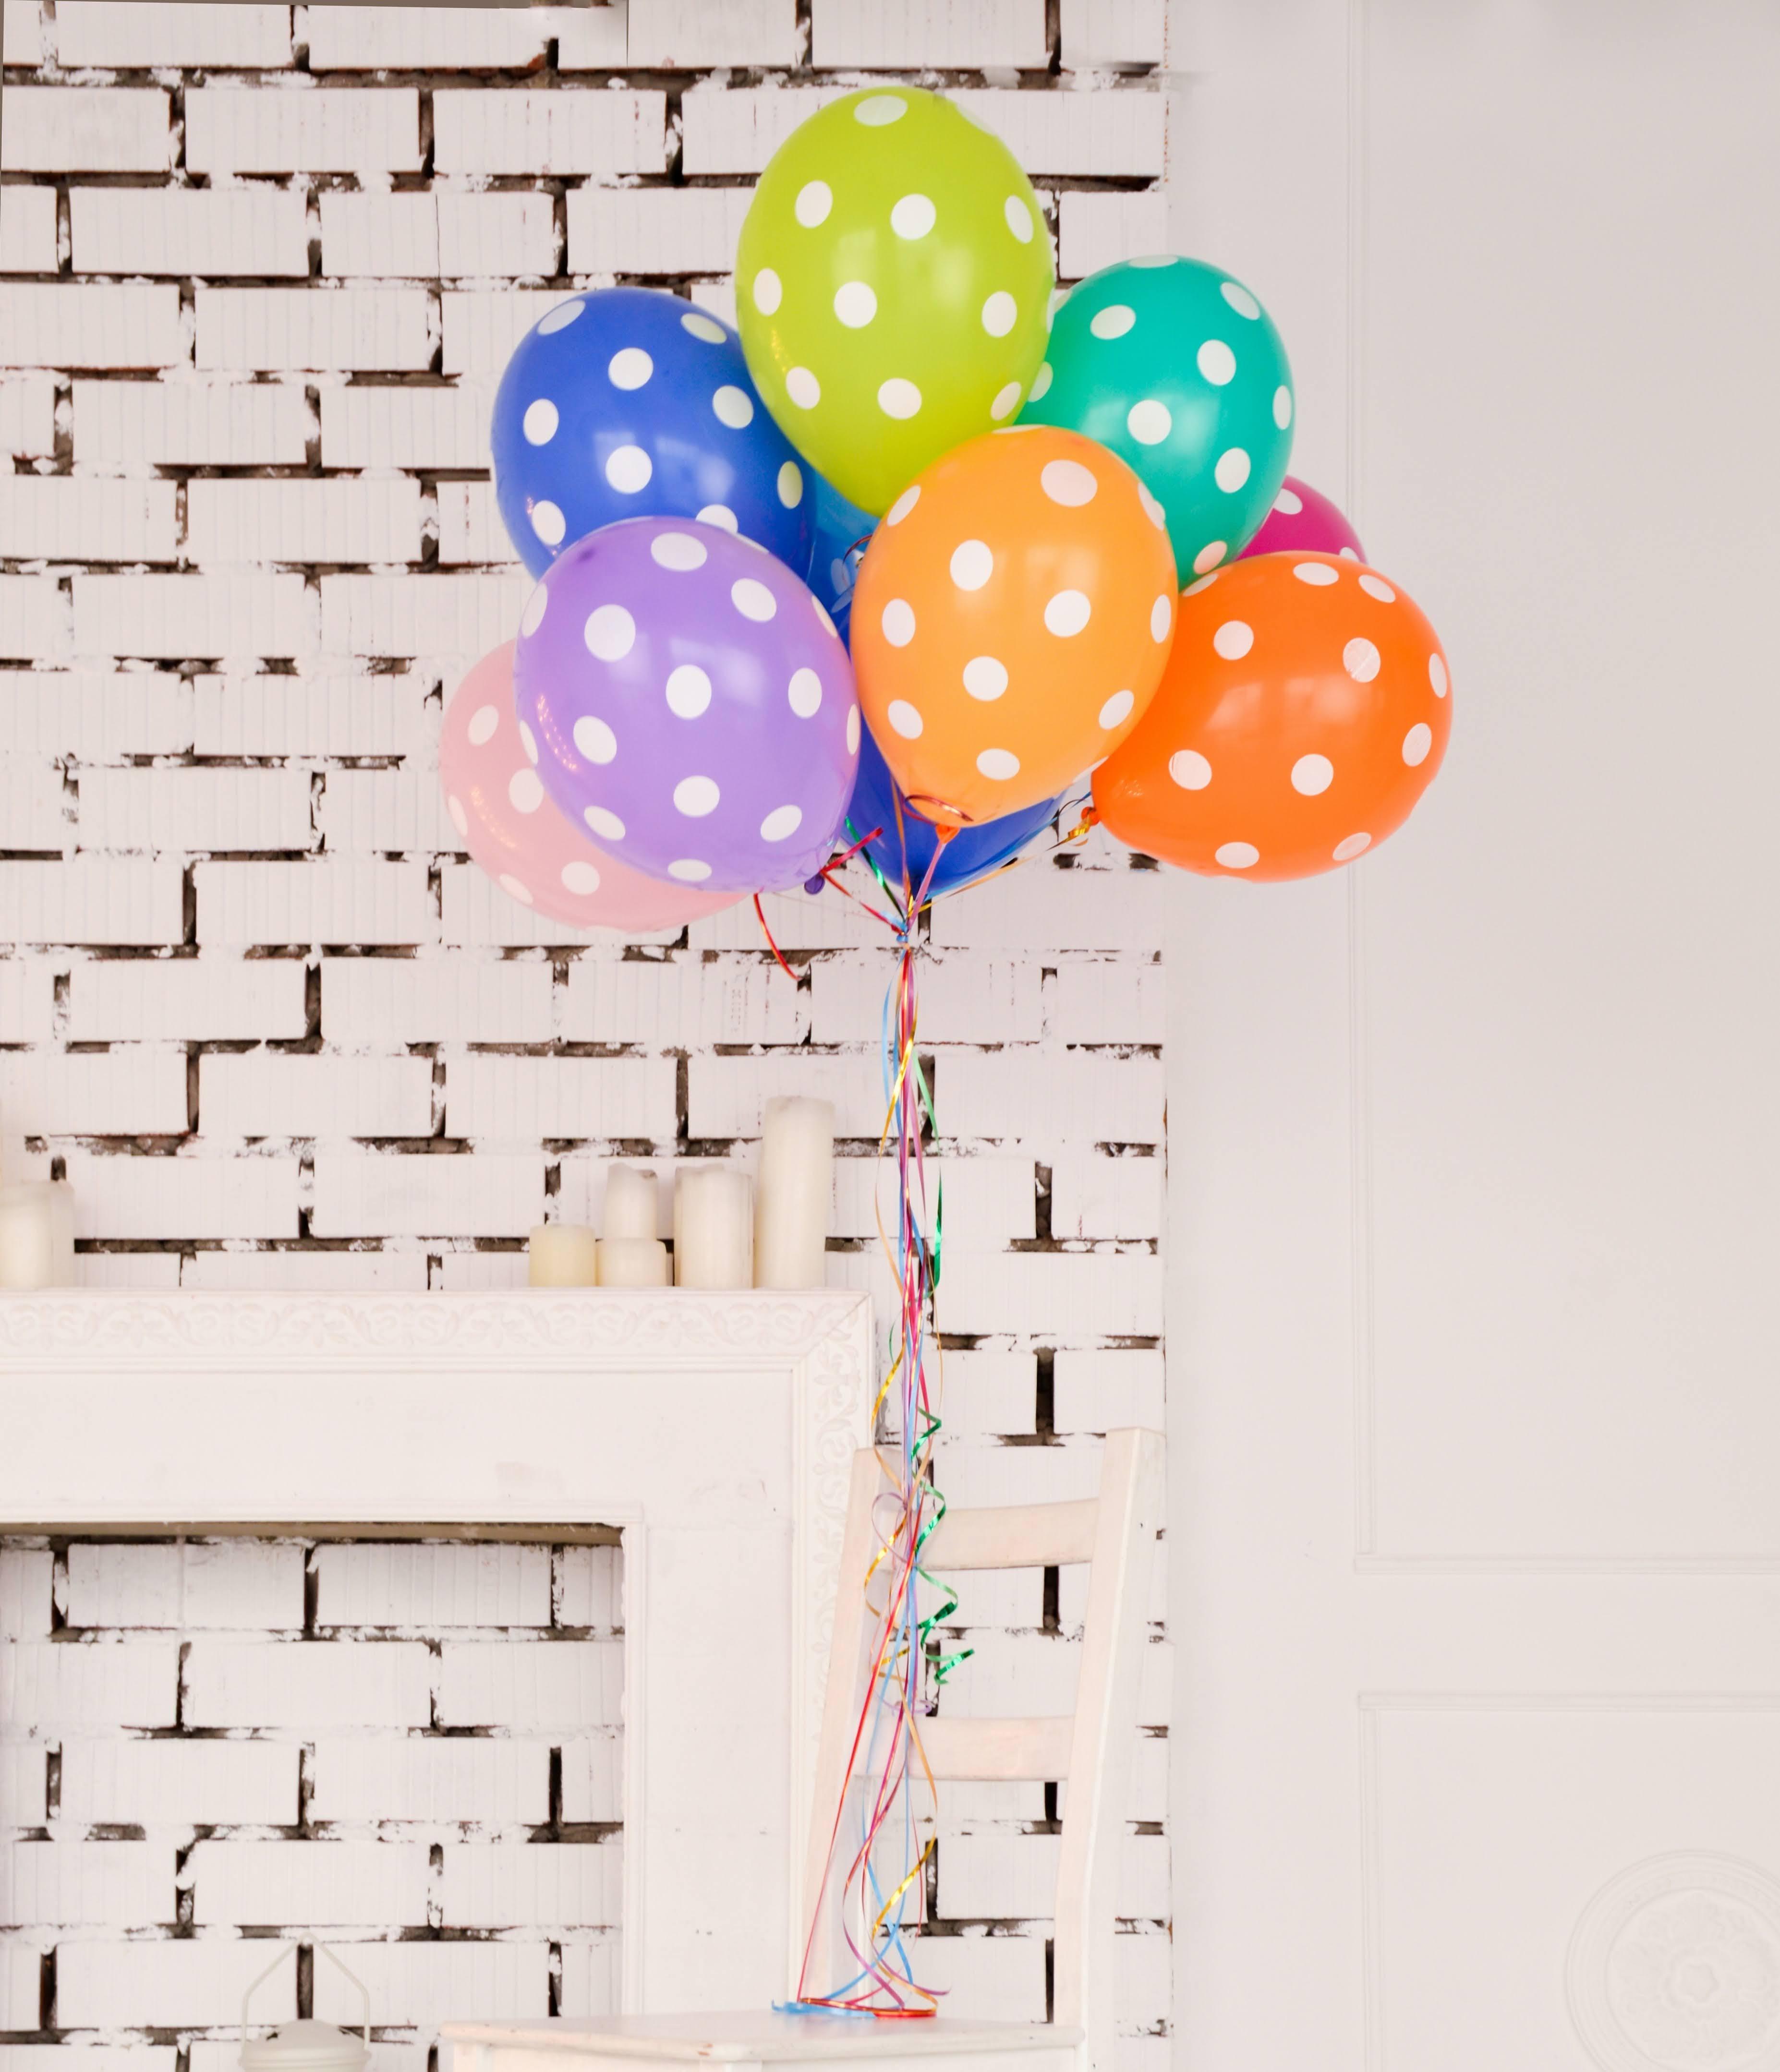 Assorted Color Polka Dot Balloons | Photo by Sofiya Levchenko via Unsplash